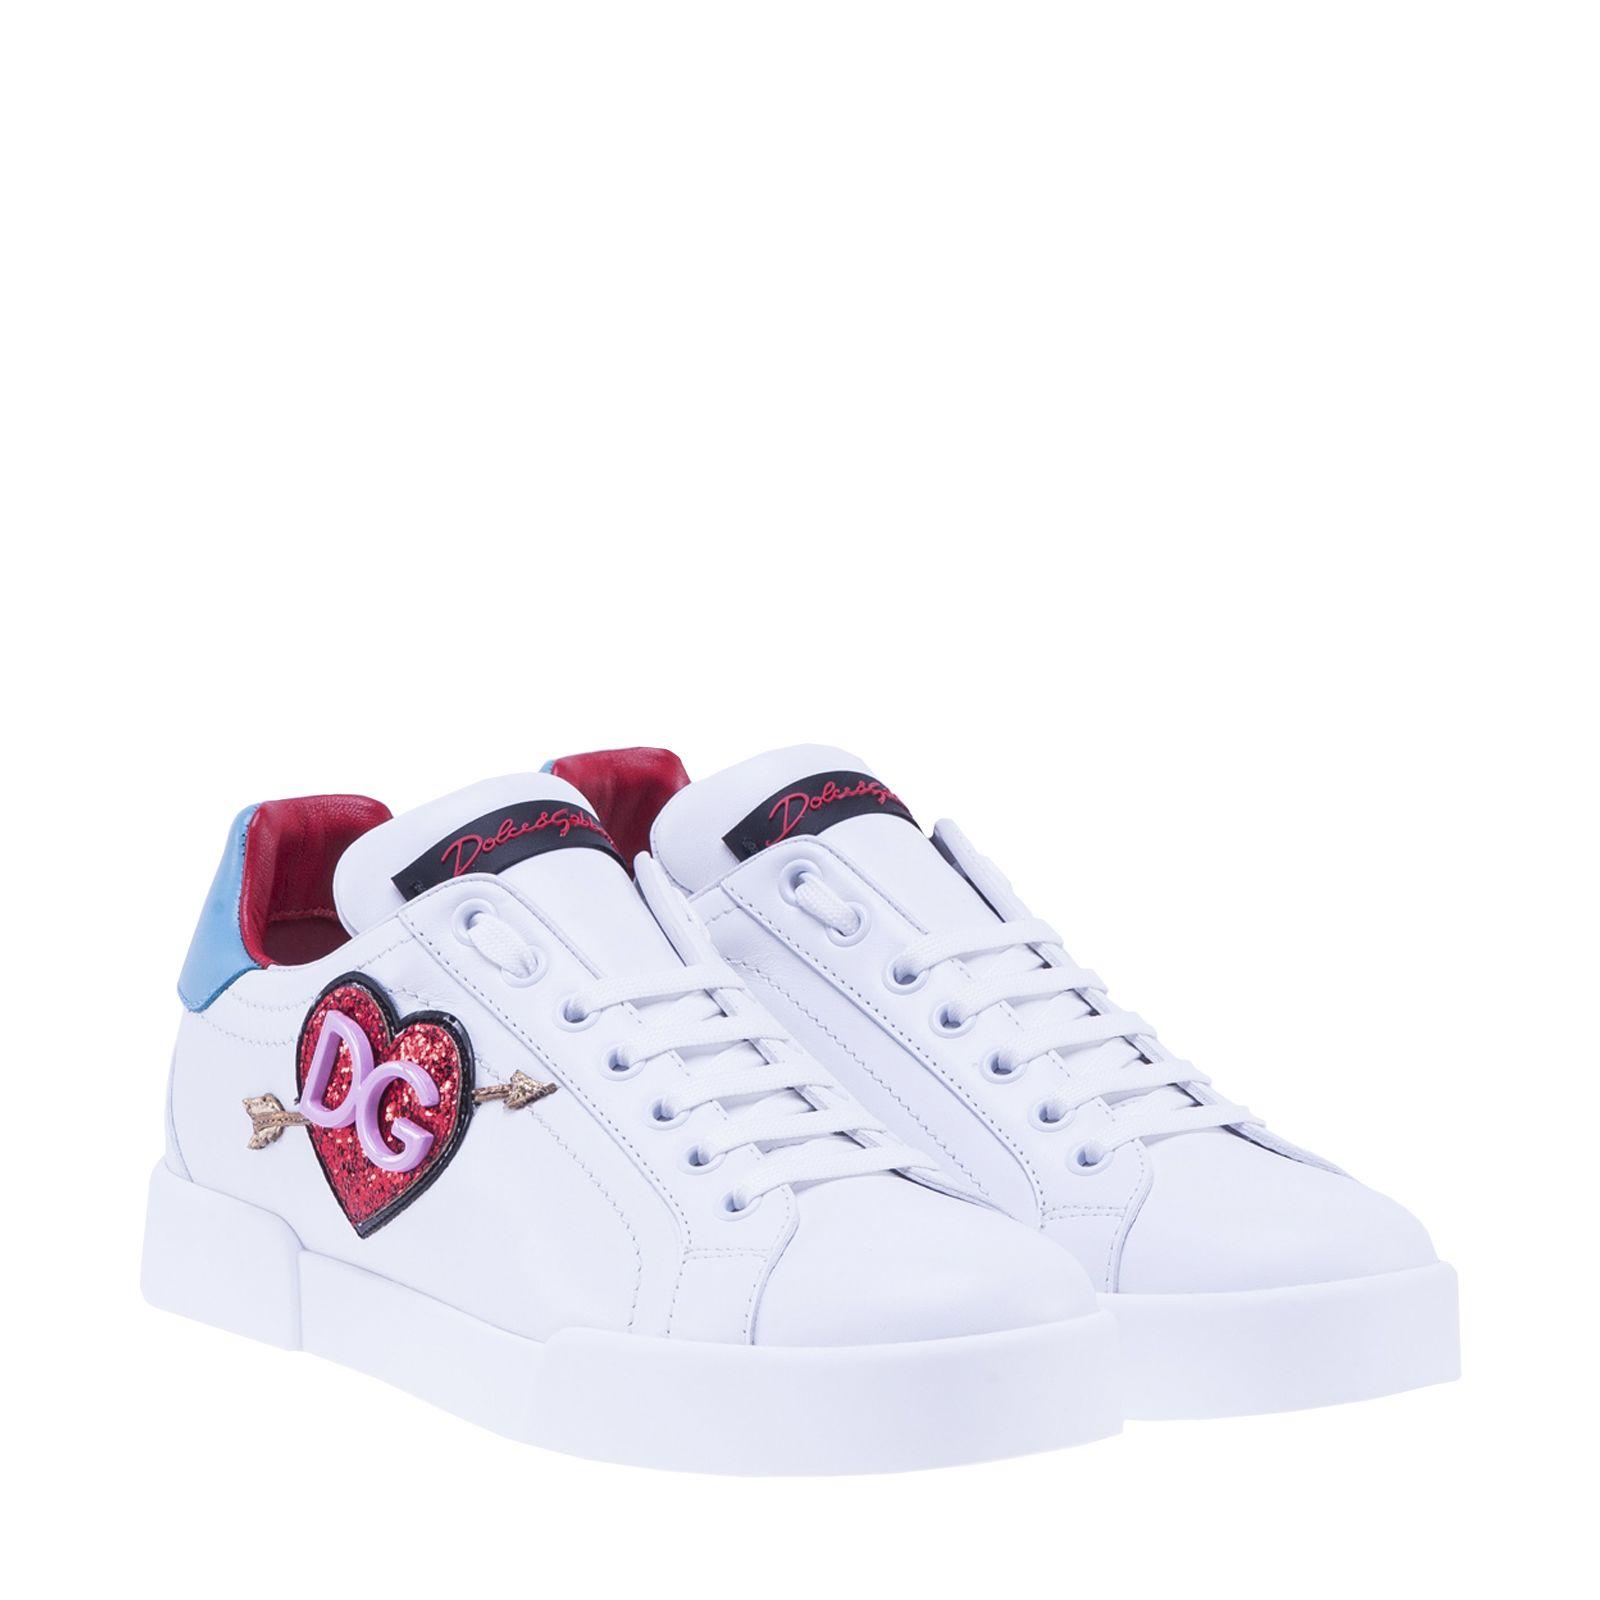 dolce gabbana dolce gabbana heart sneakers white women 39 s sneakers italist. Black Bedroom Furniture Sets. Home Design Ideas